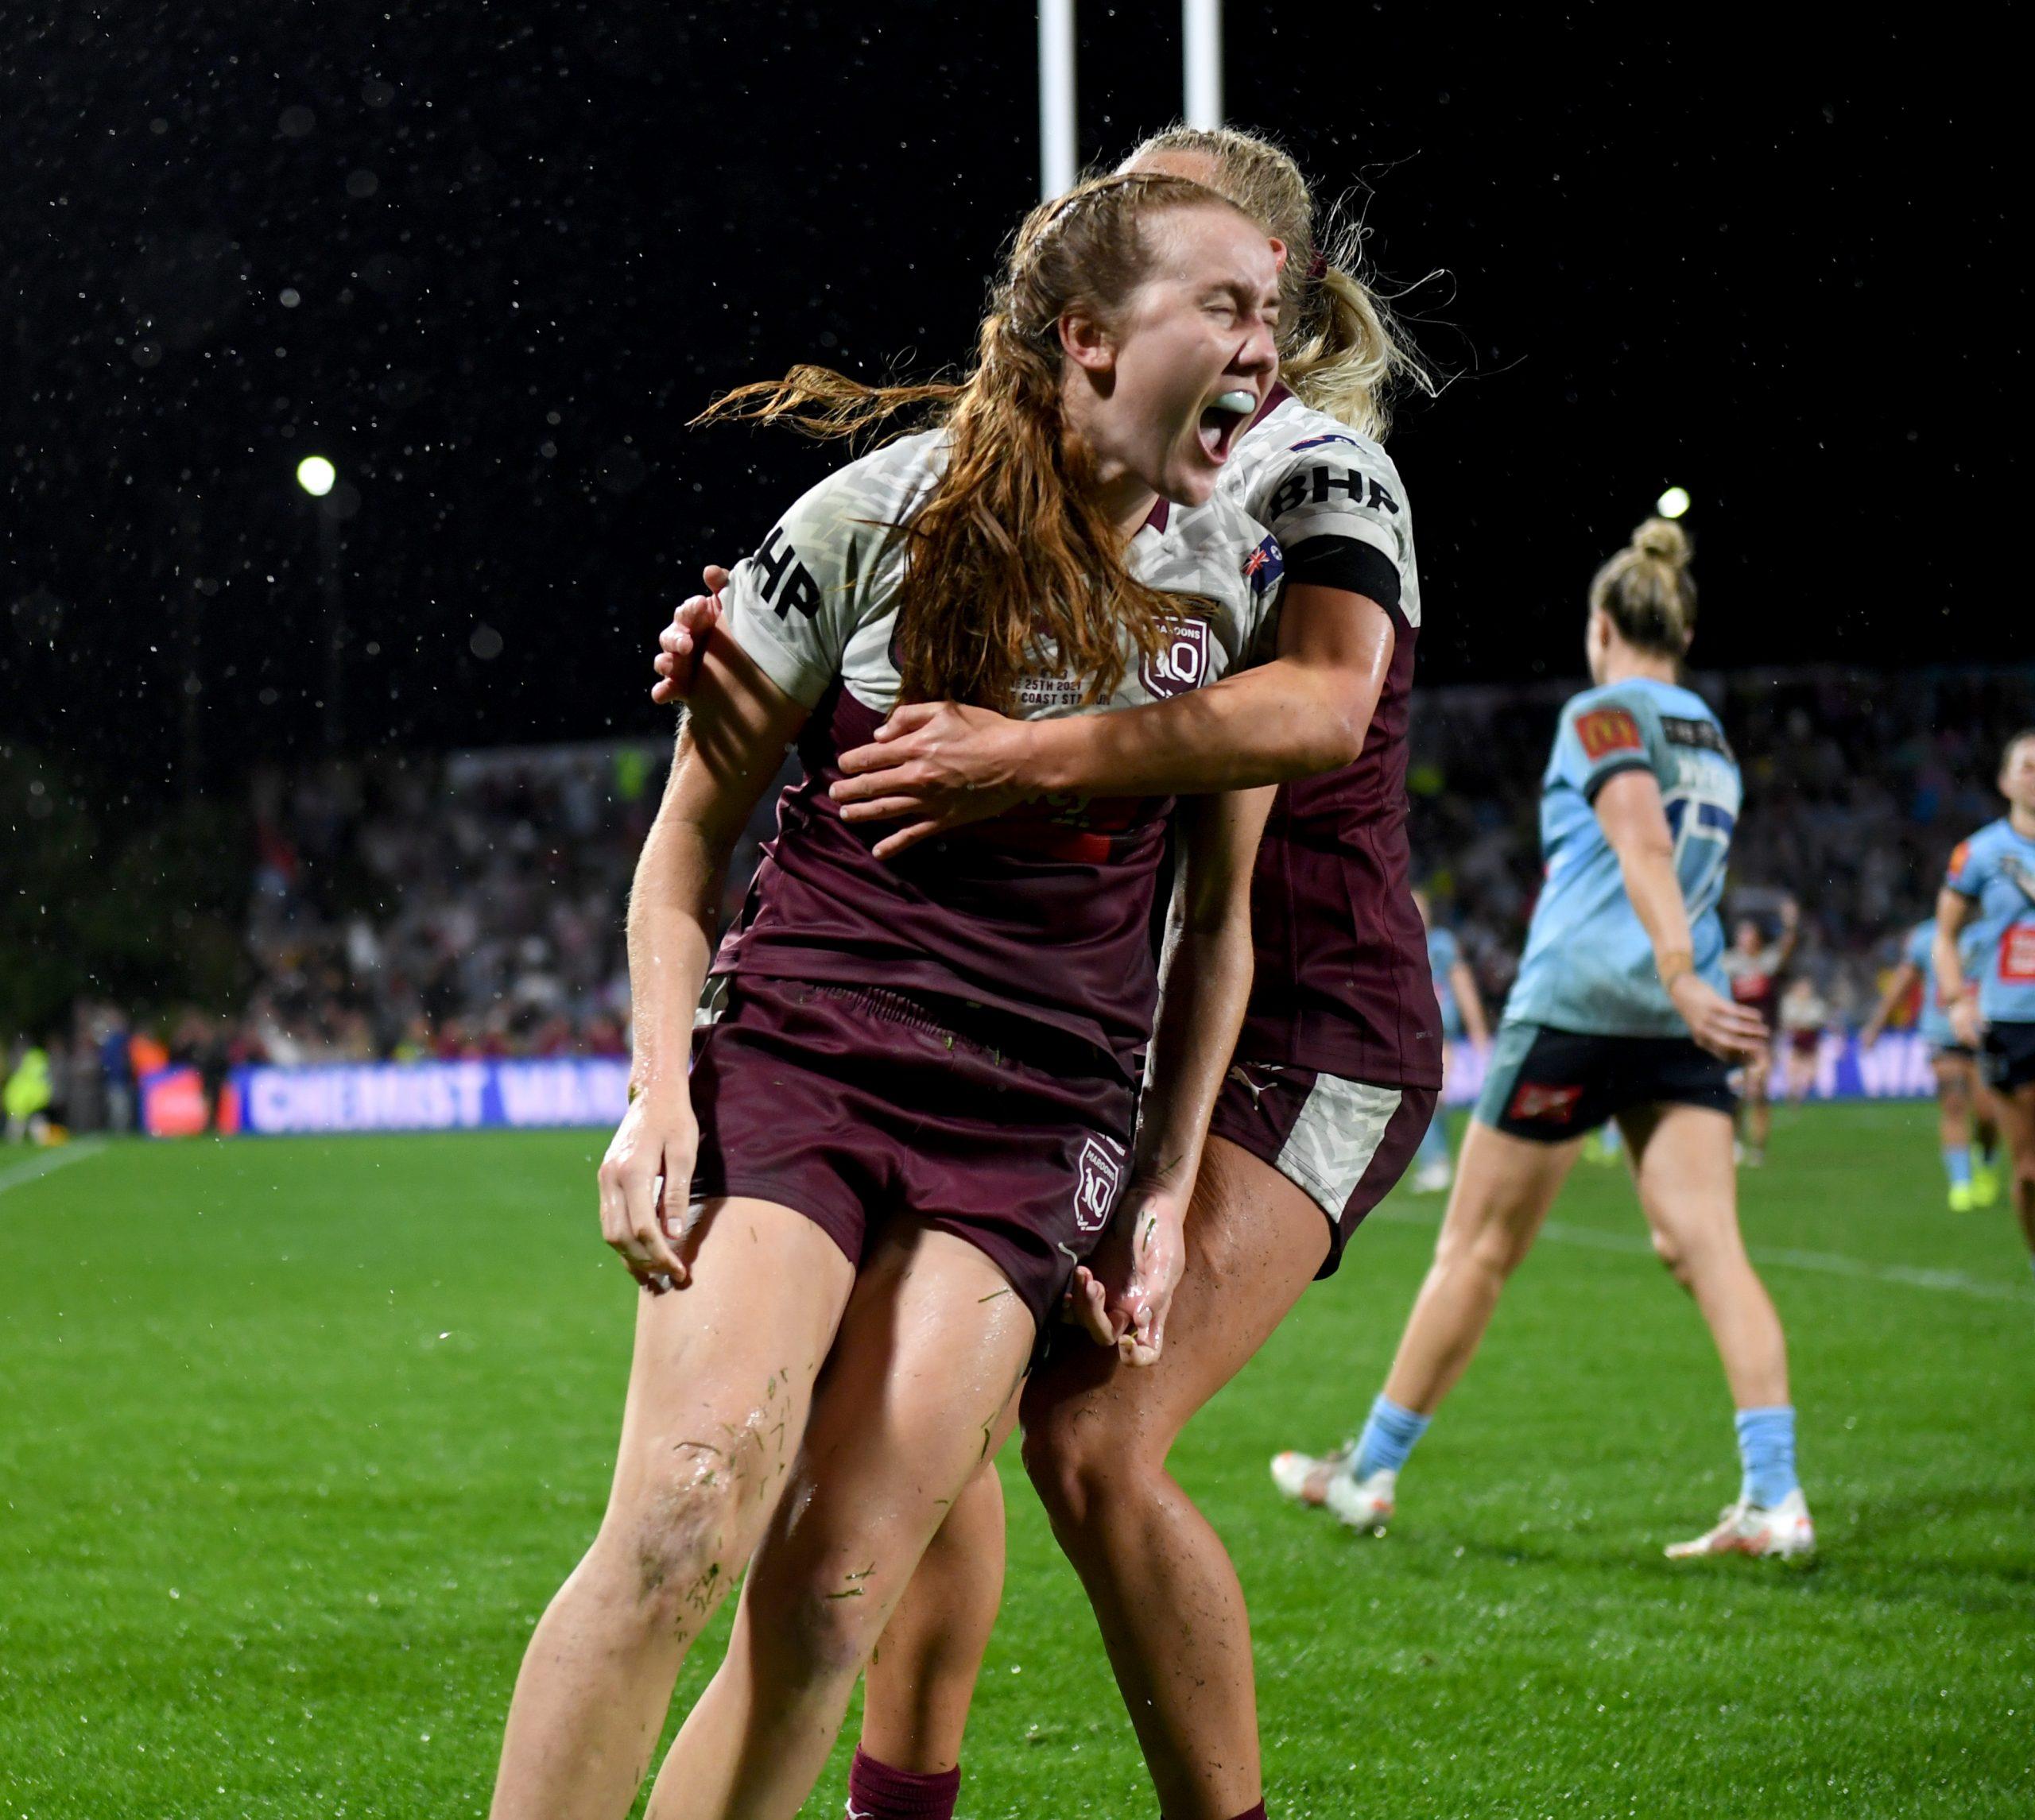 Last-minute penalty goal gives Queensland Maroons win over NSW Sky Blues in Women's Origin